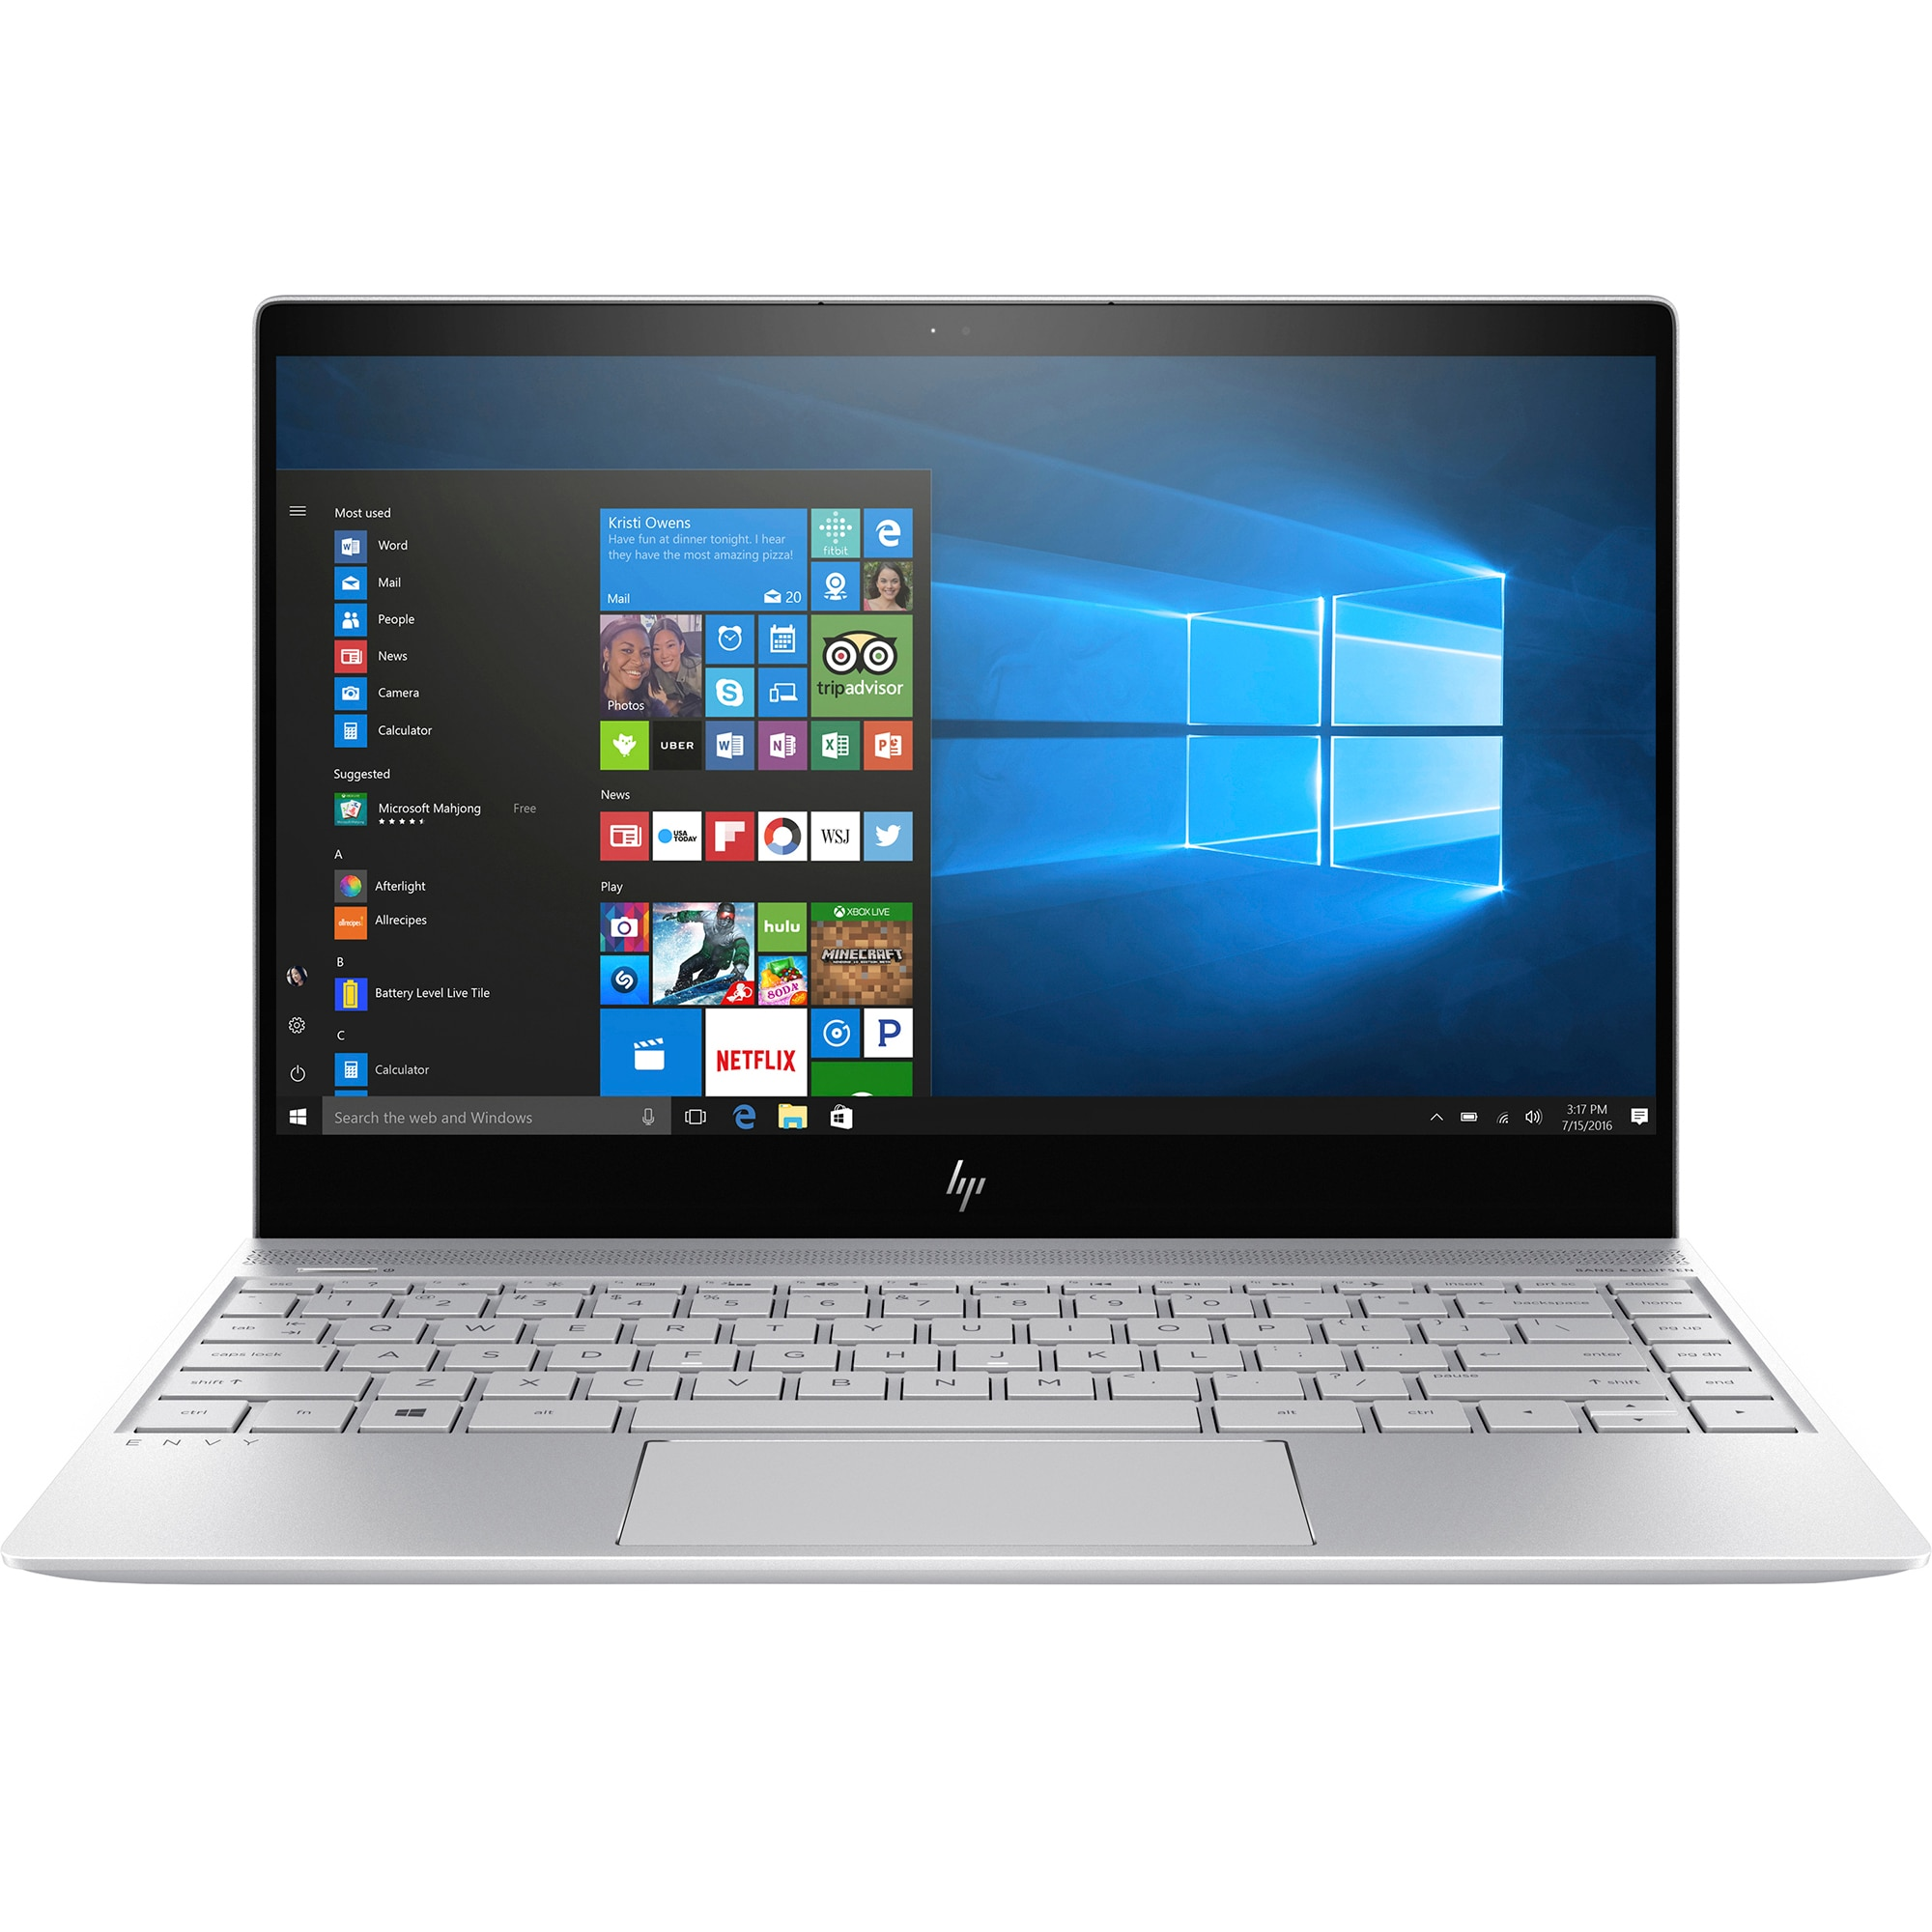 "Fotografie Laptop HP ENVY 13-ad004nn cu procesor Intel® Core™ i5-7200U pana la 3.10 GHz, Kaby Lake, 13.3"", Full HD, IPS, 8GB, 256GB, Intel® HD Graphics, Microsoft Windows 10, Silver"